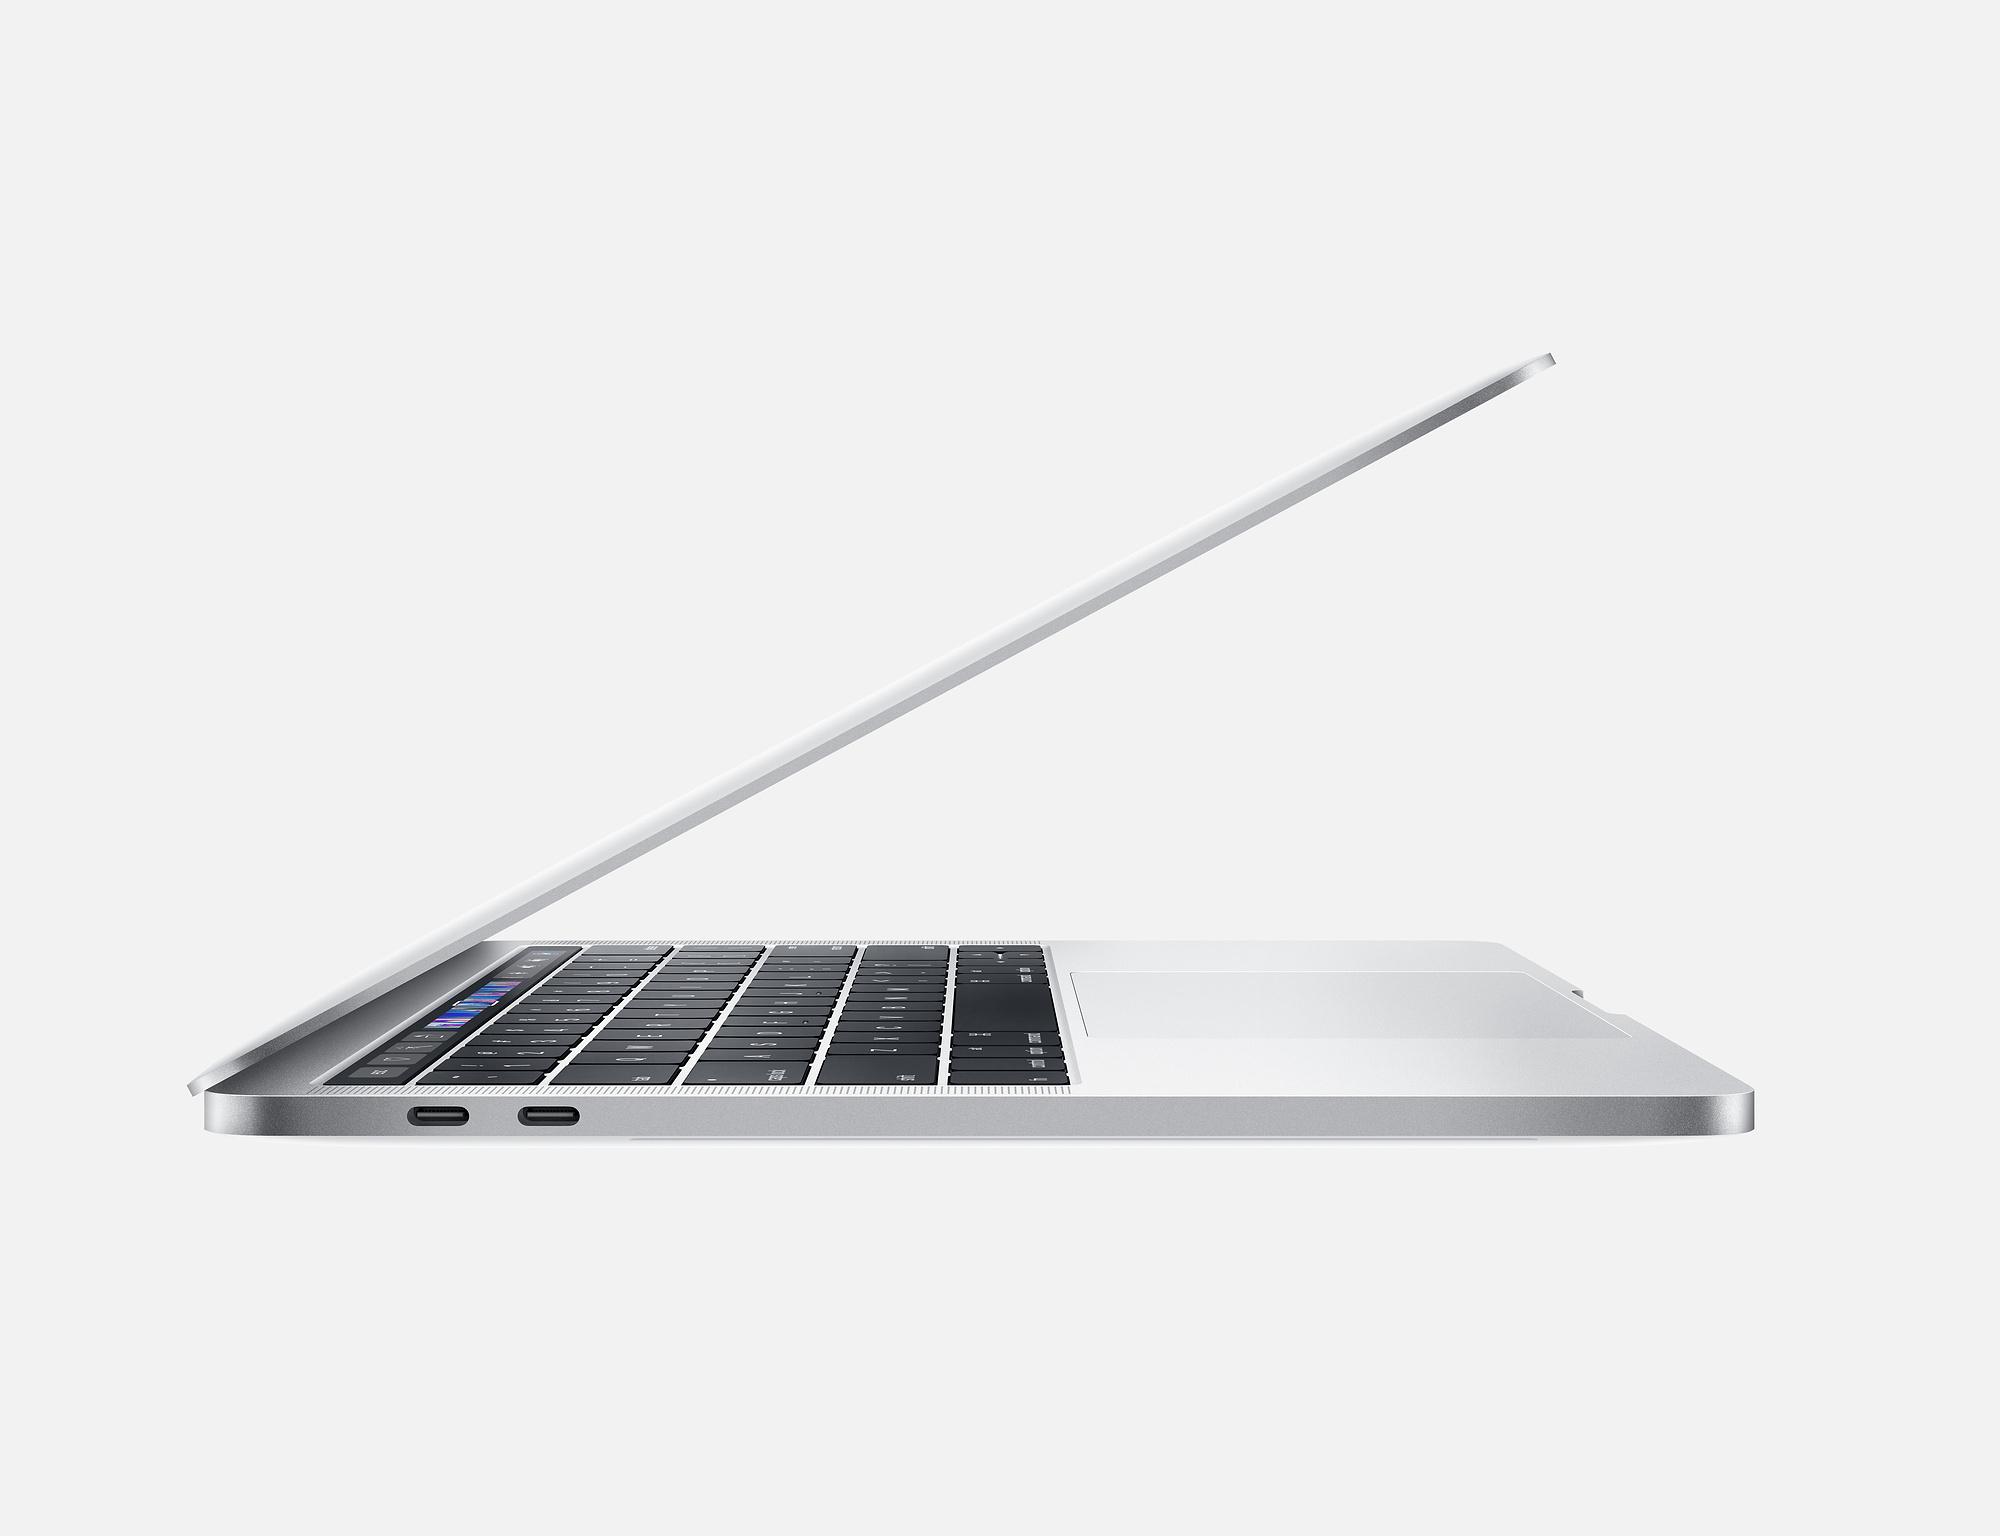 MacBook Pro 13'' TB 2.4GHz QC i5 8GB 256GB Silver